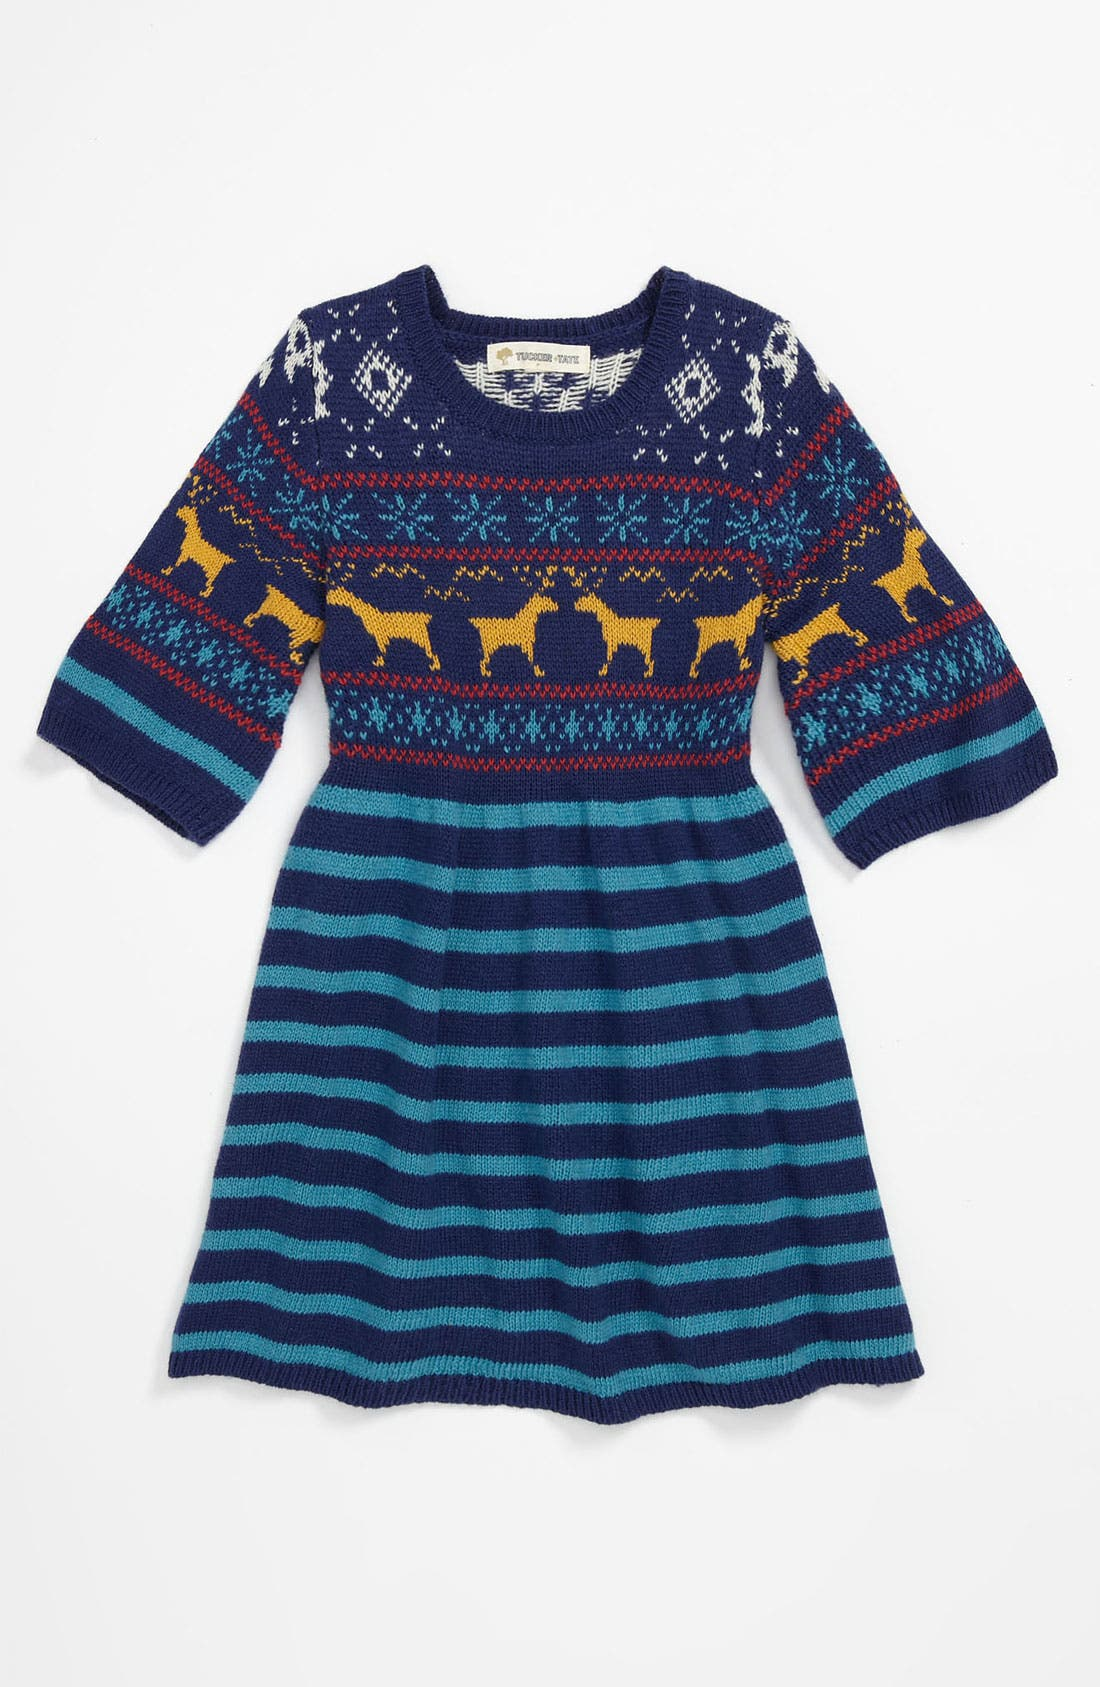 Alternate Image 1 Selected - Tucker + Tate 'Faye' Sweater Dress (Toddler)